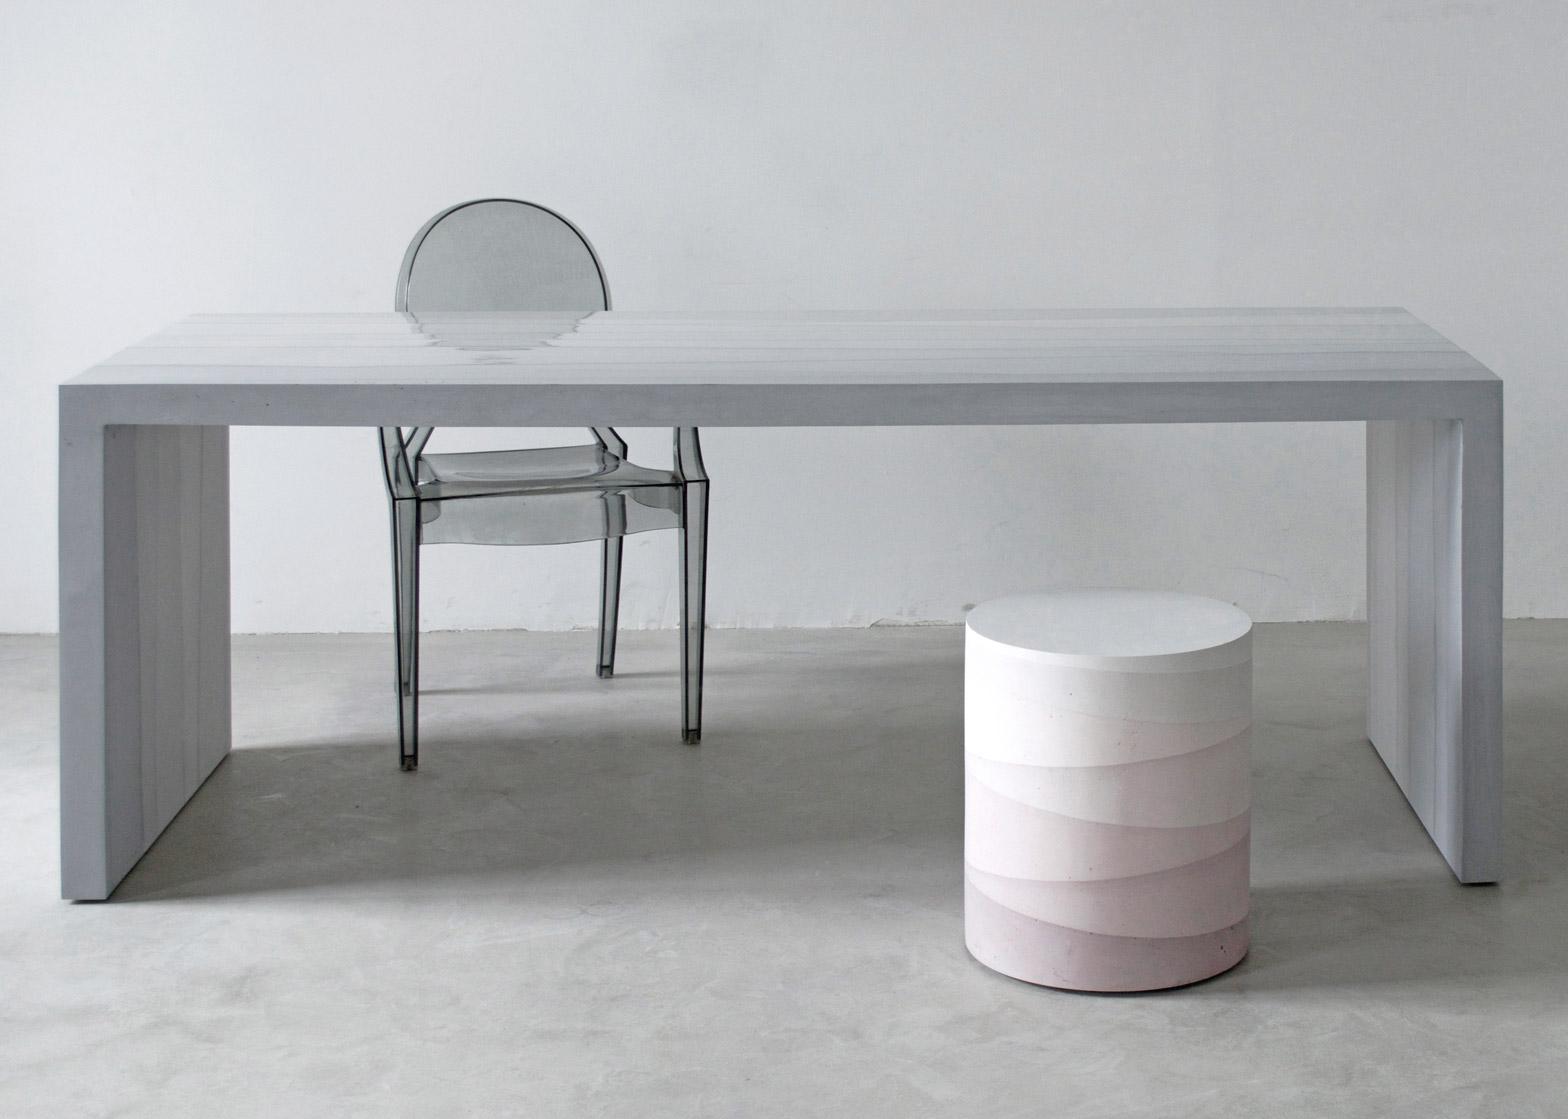 fada-fernando-mastrangelo-mm-material-cement-furniture-offsite-new-york-design-week_dezeen_1568_5